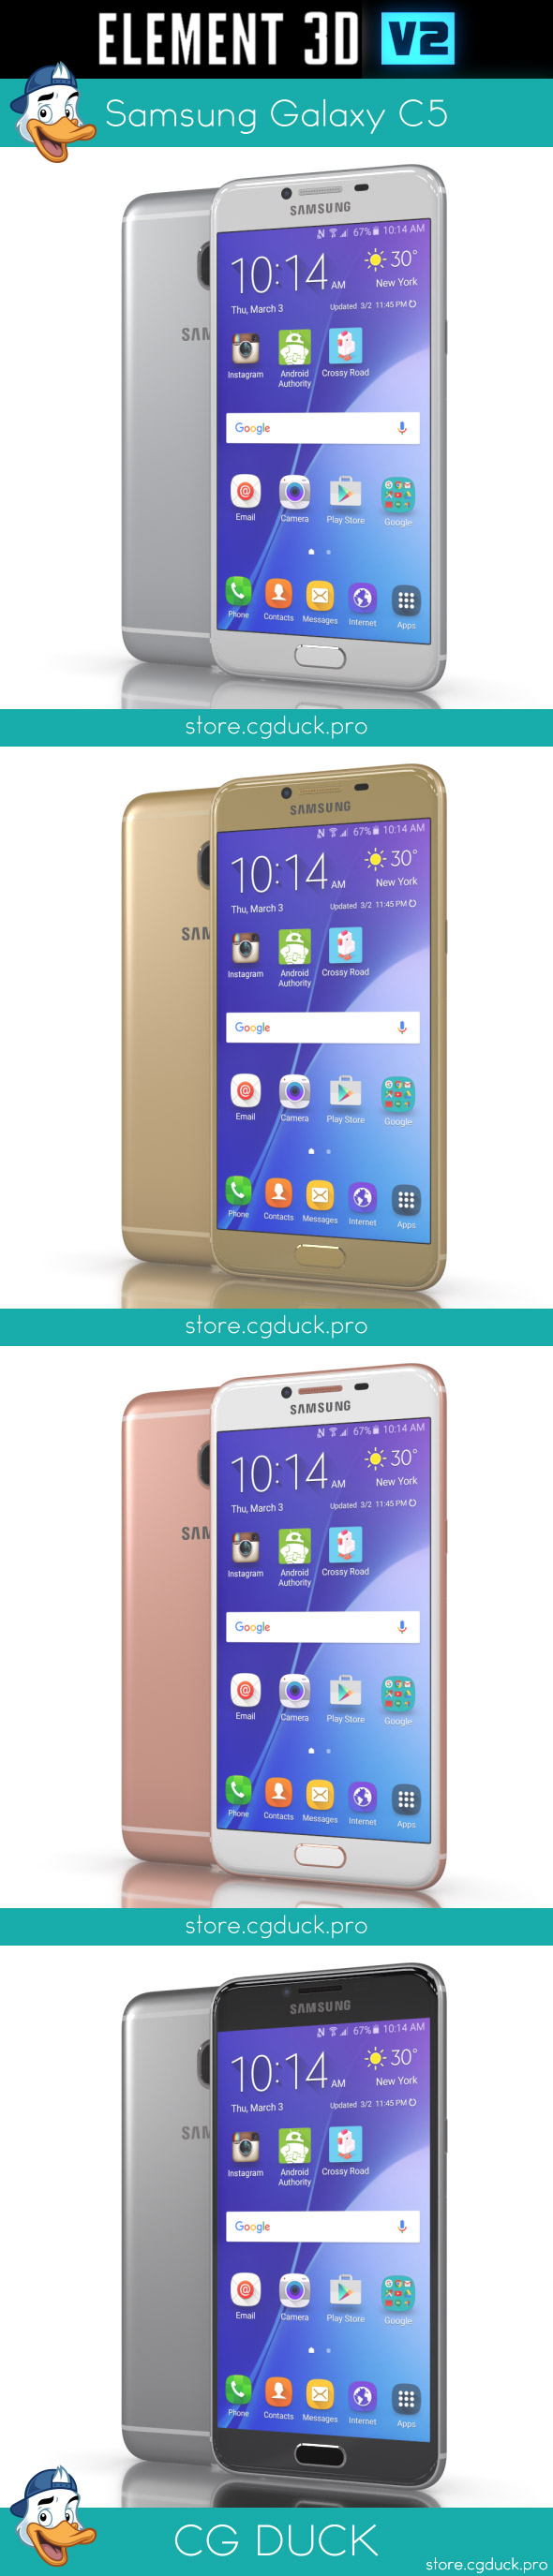 Samsung galaxy j7 for element 3d - Samsung Galaxy J7 For Element 3d 58